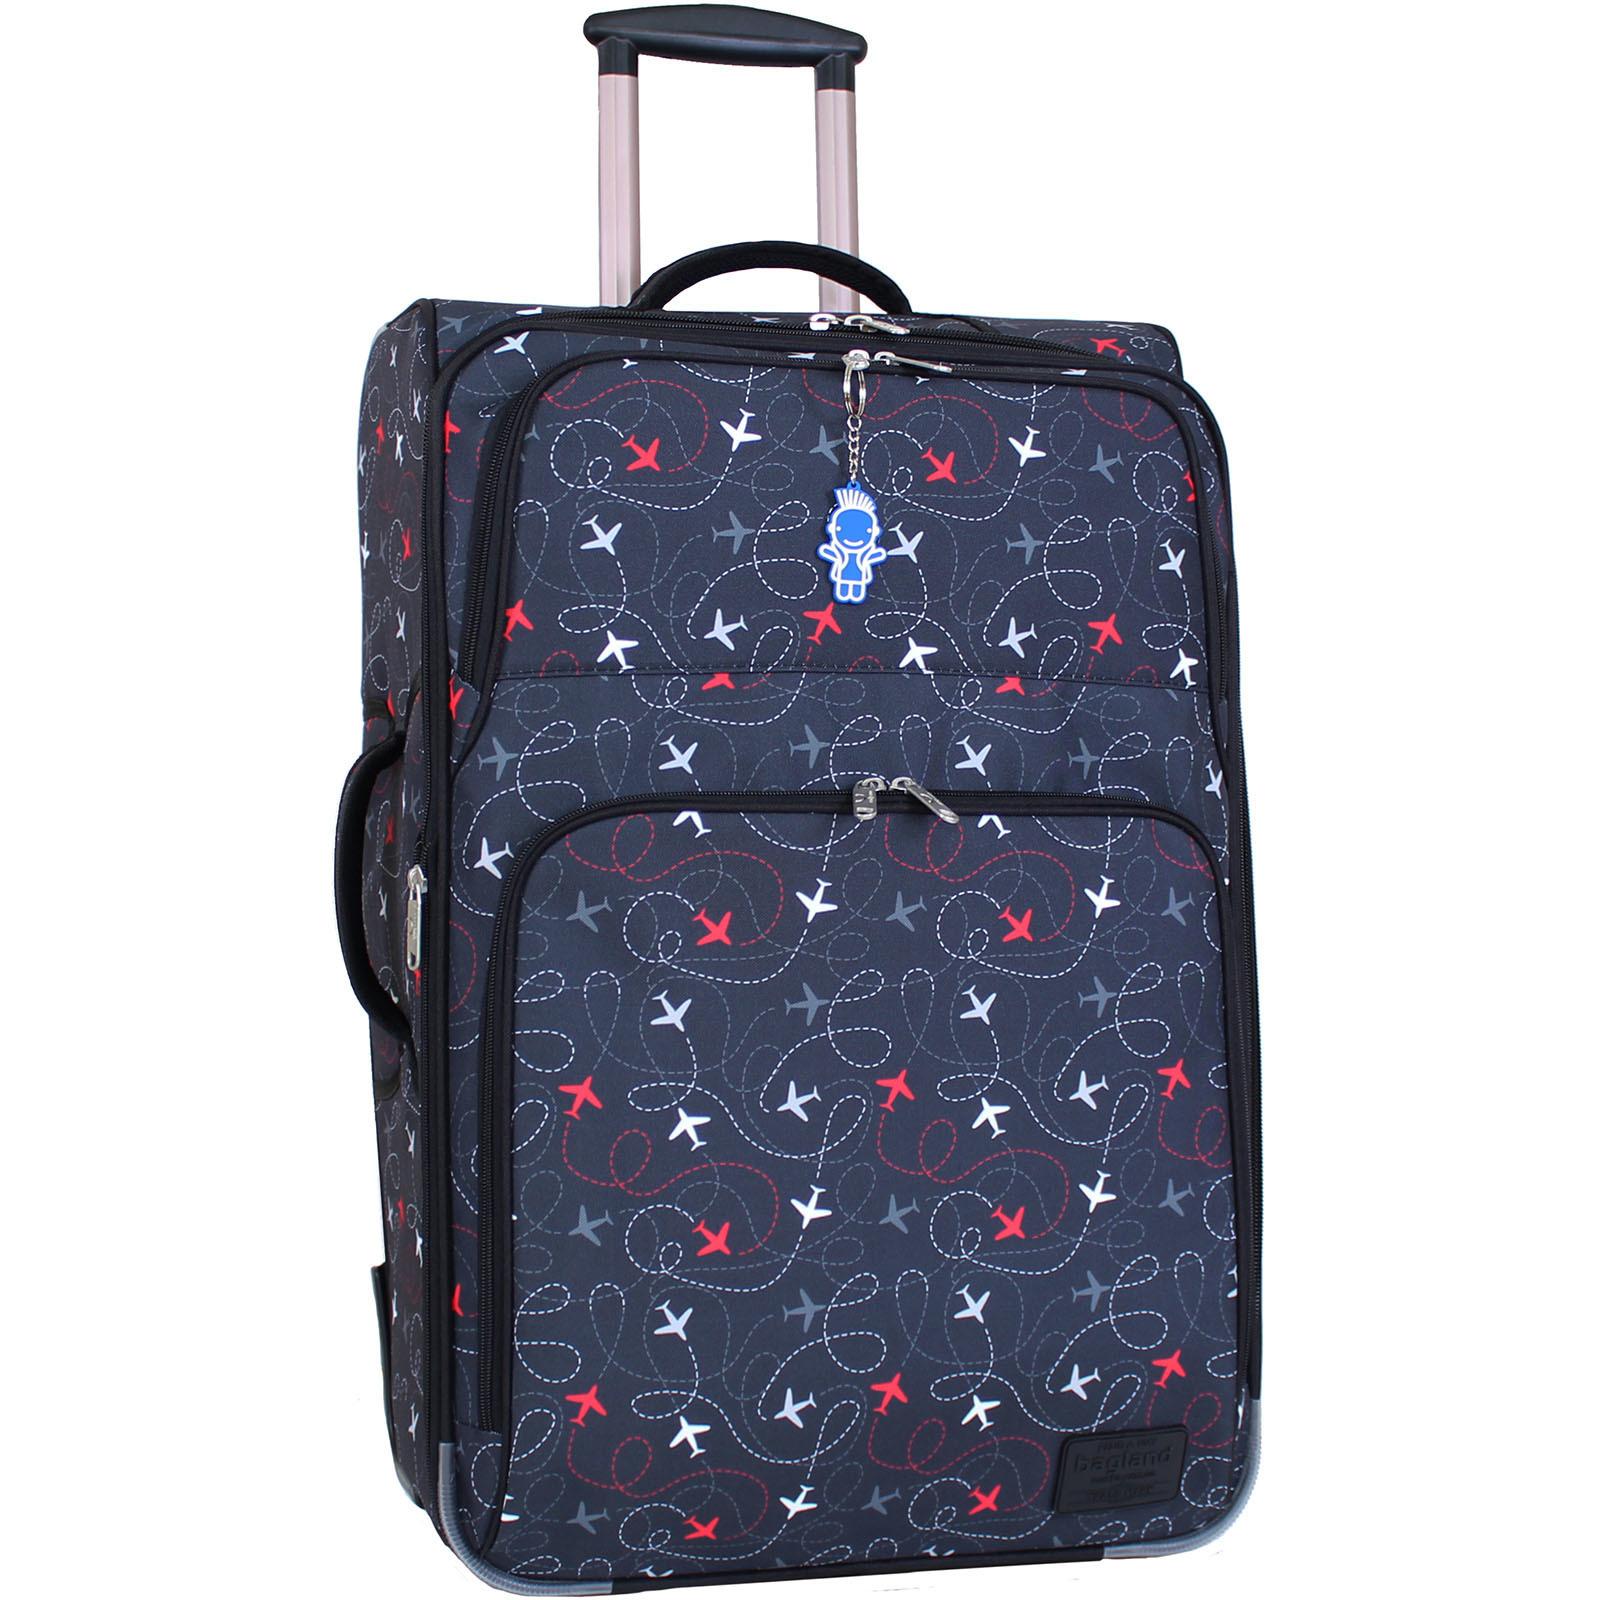 Дорожные чемоданы Чемодан Bagland Леон большой дизайн 70 л. сублімація 265 (0037666274) IMG_9772.JPG